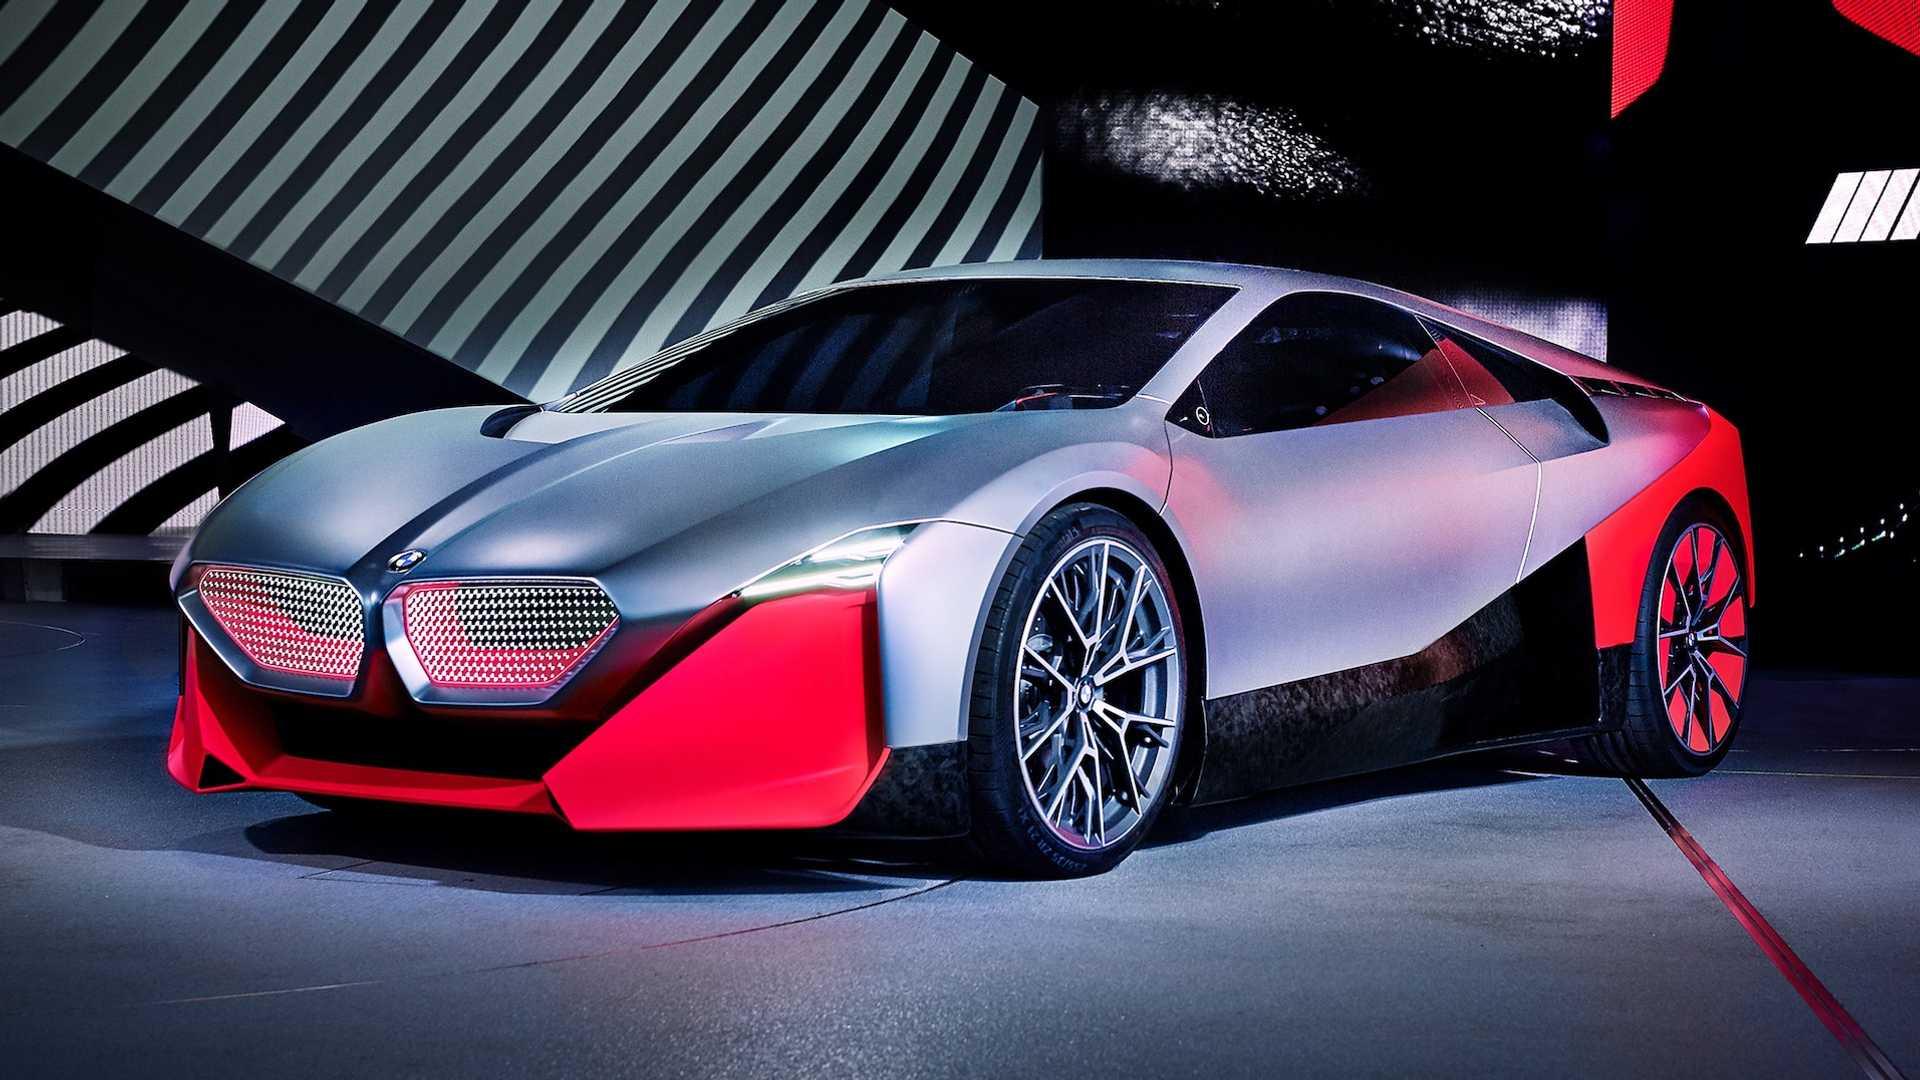 Концерн BMW отказался от разработки серийной версии концепта Vision M Next